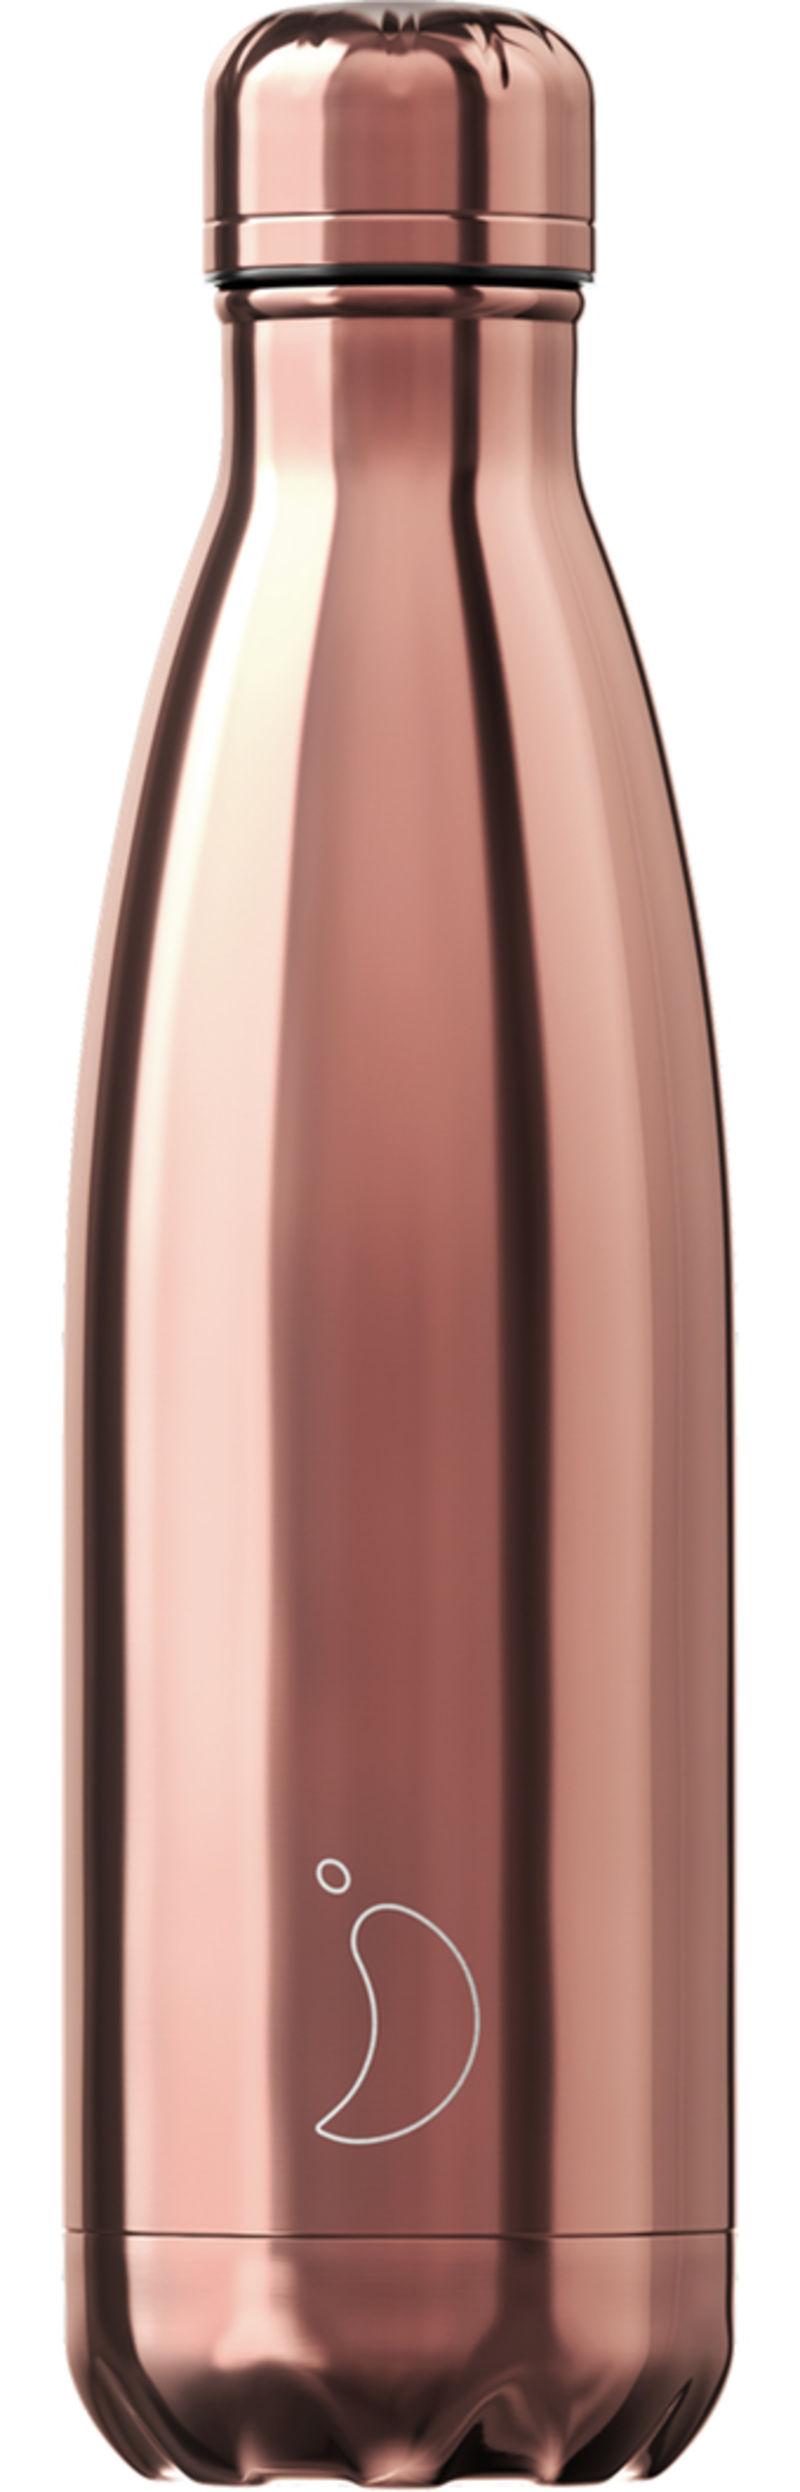 Botella Inox Tropical Oro Rosa 500ml -